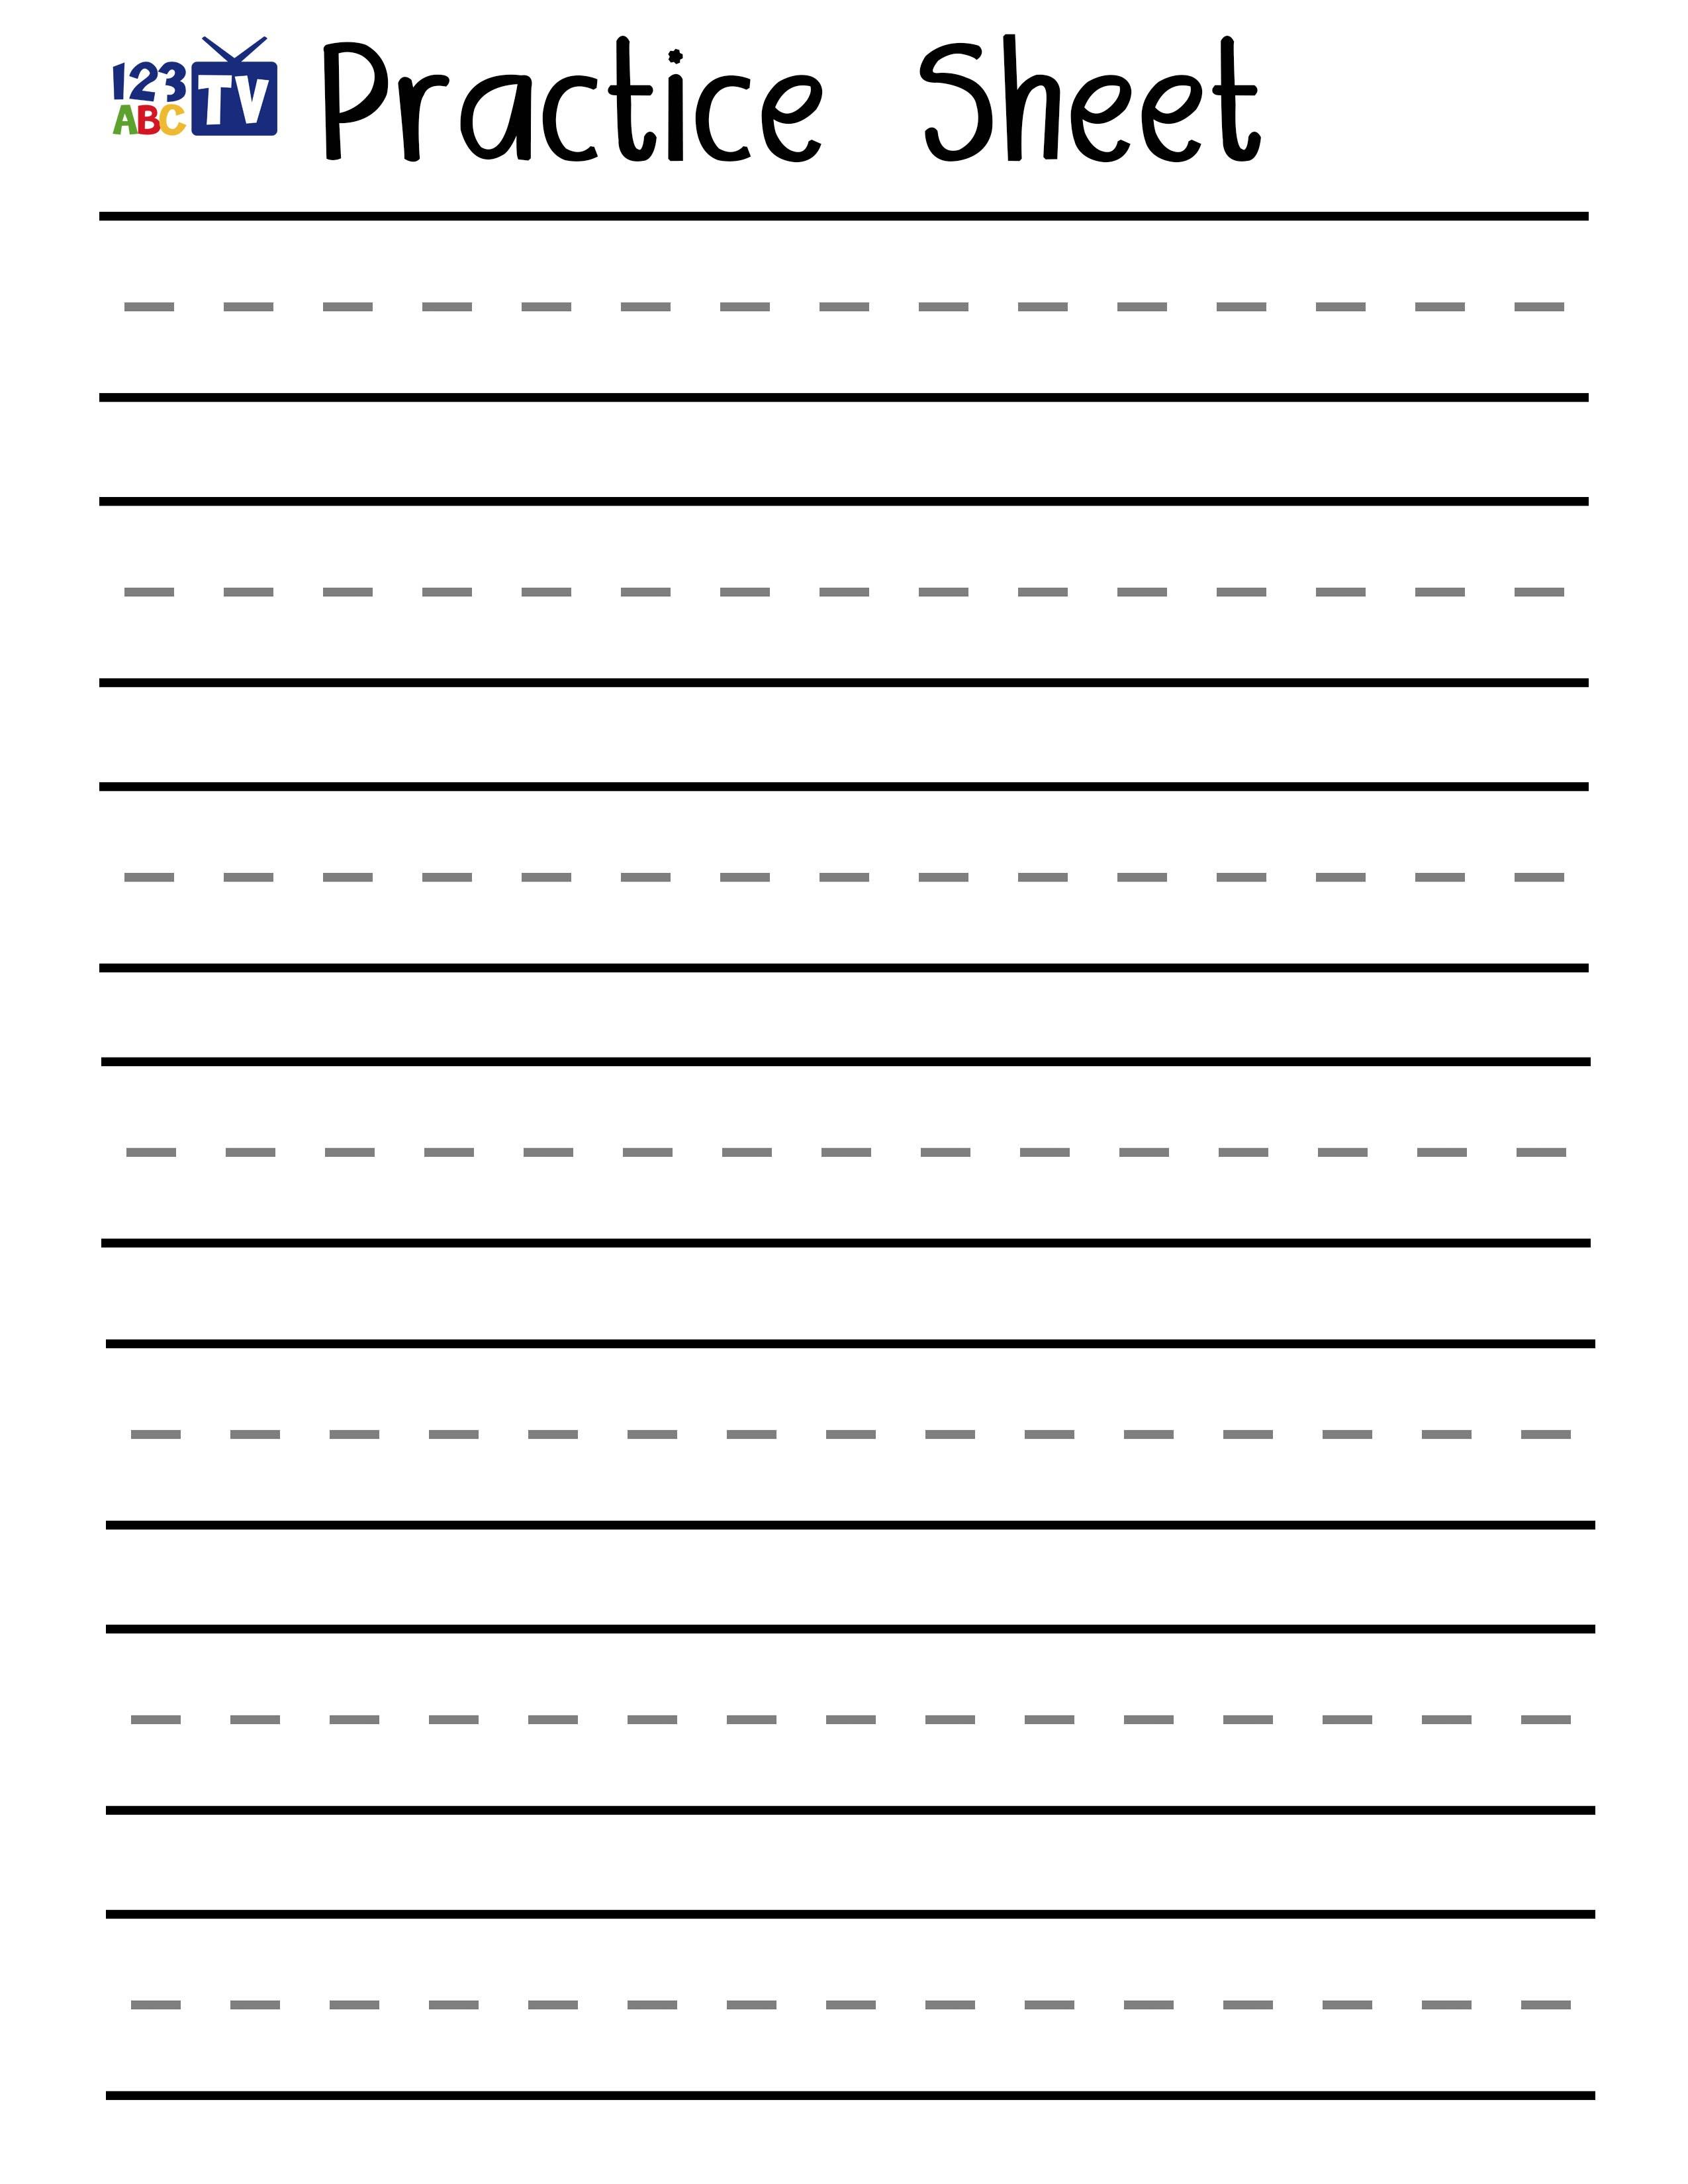 Blank Handwriting Worksheets Pdf Awesome Print Handwriting - Free | Printable Handwriting Worksheets